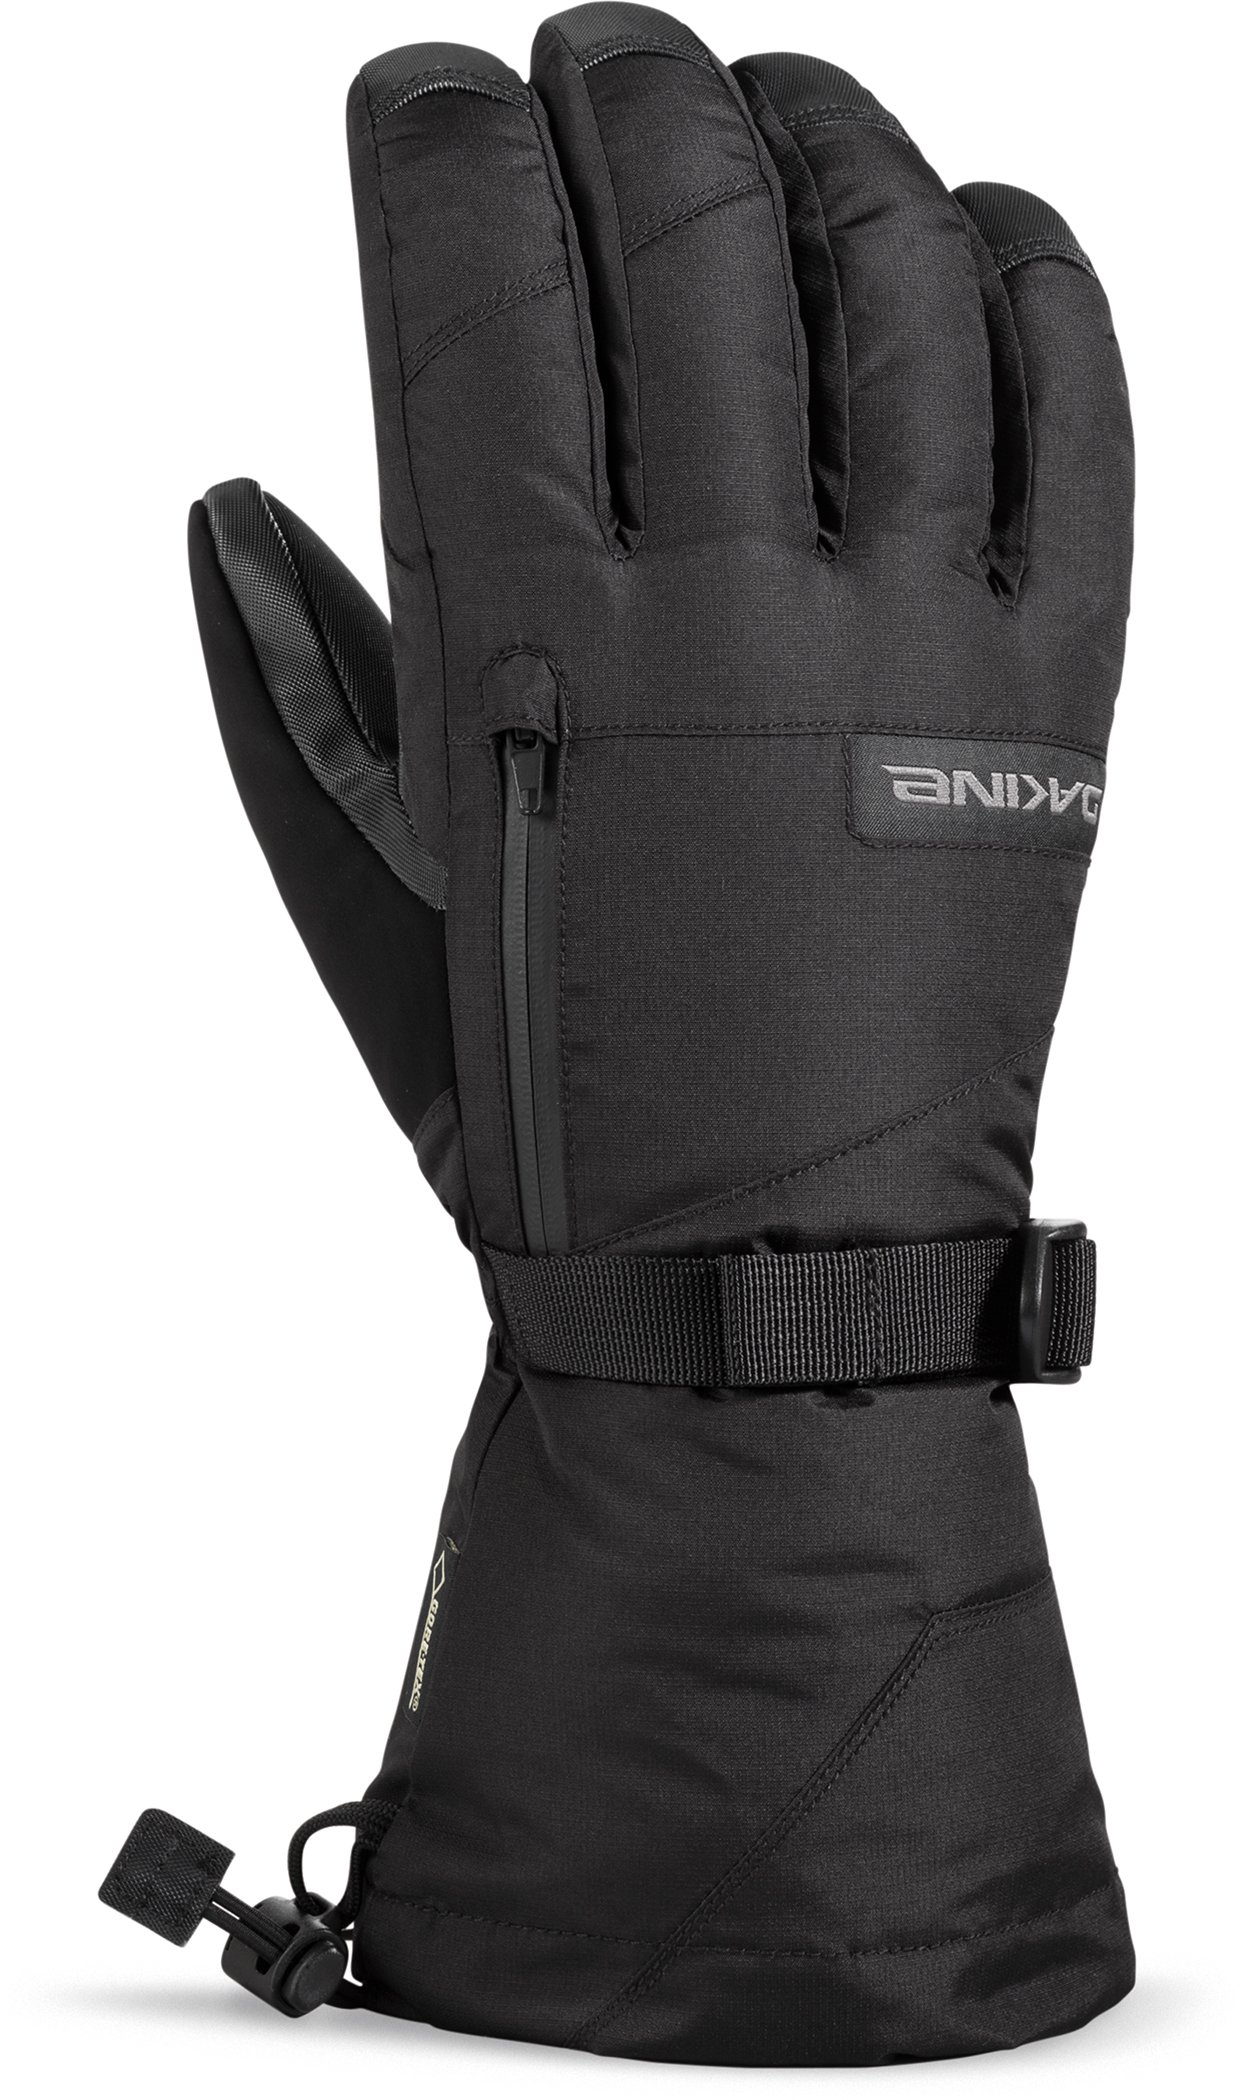 Dakine Men's Titan Glove, Black, XX-Large by Dakine